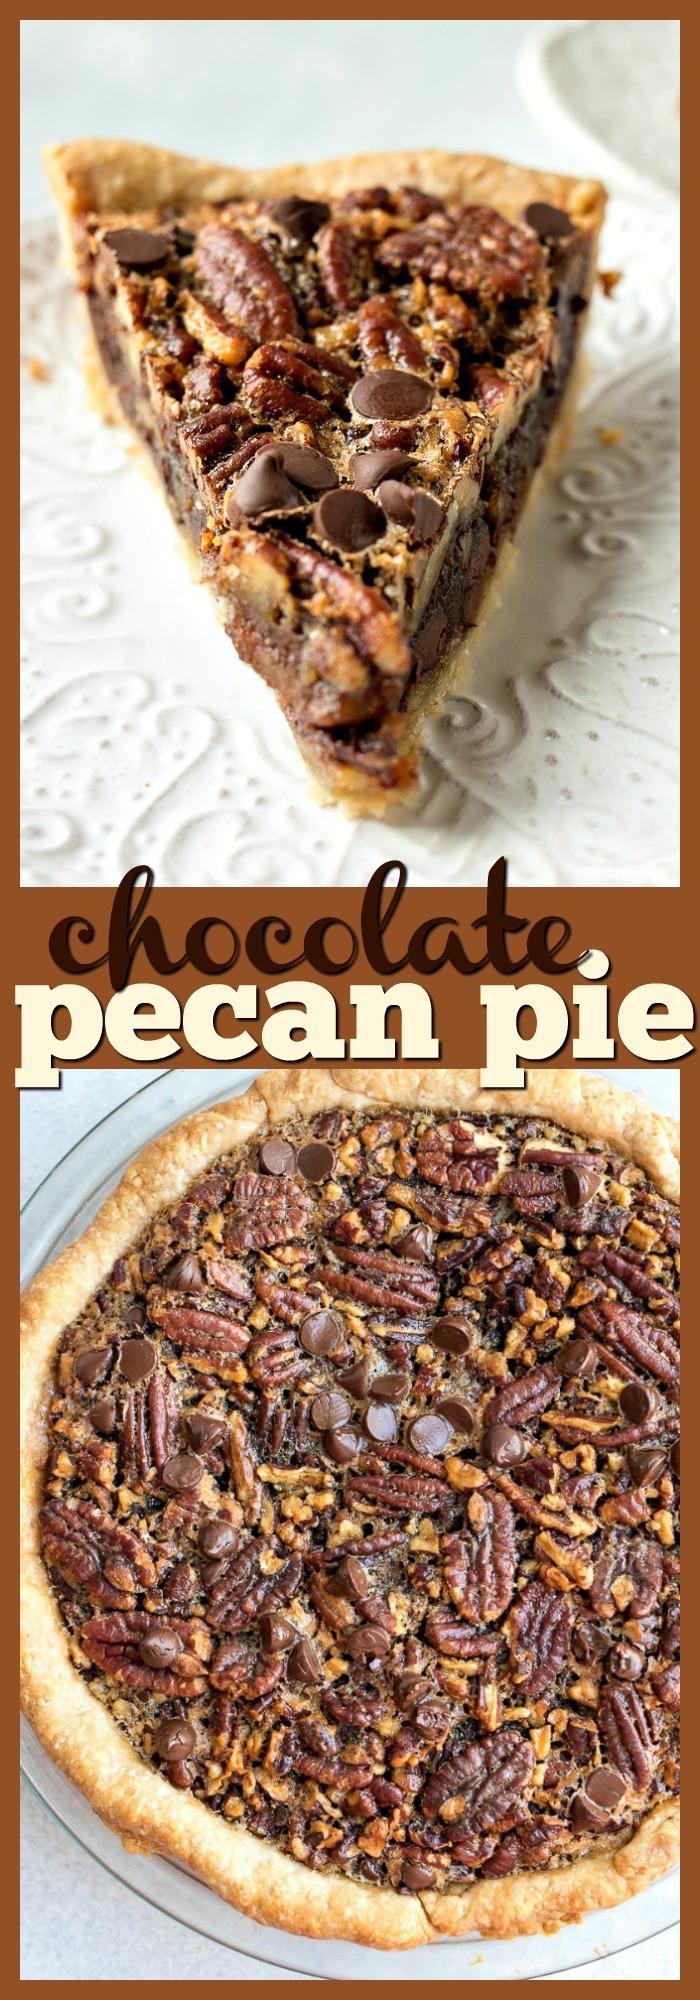 Chocolate Pecan Pie photo collage